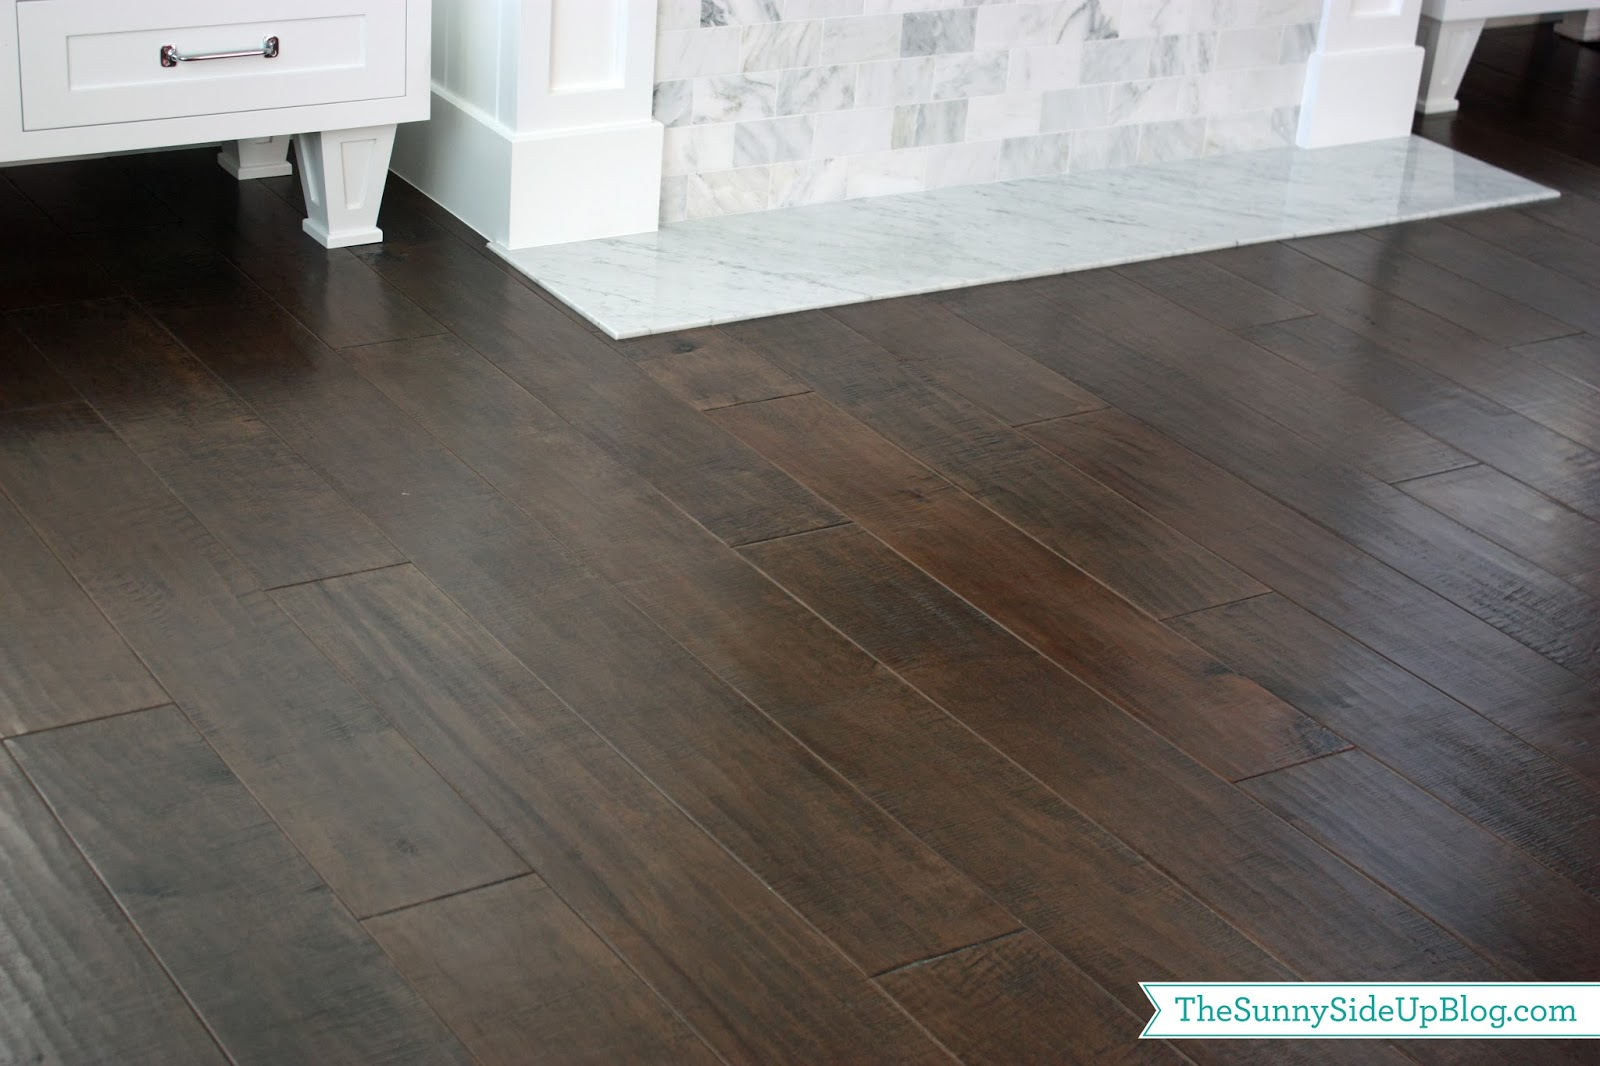 Greatest Hardwood Flooring - The Sunny Side Up Blog VM13